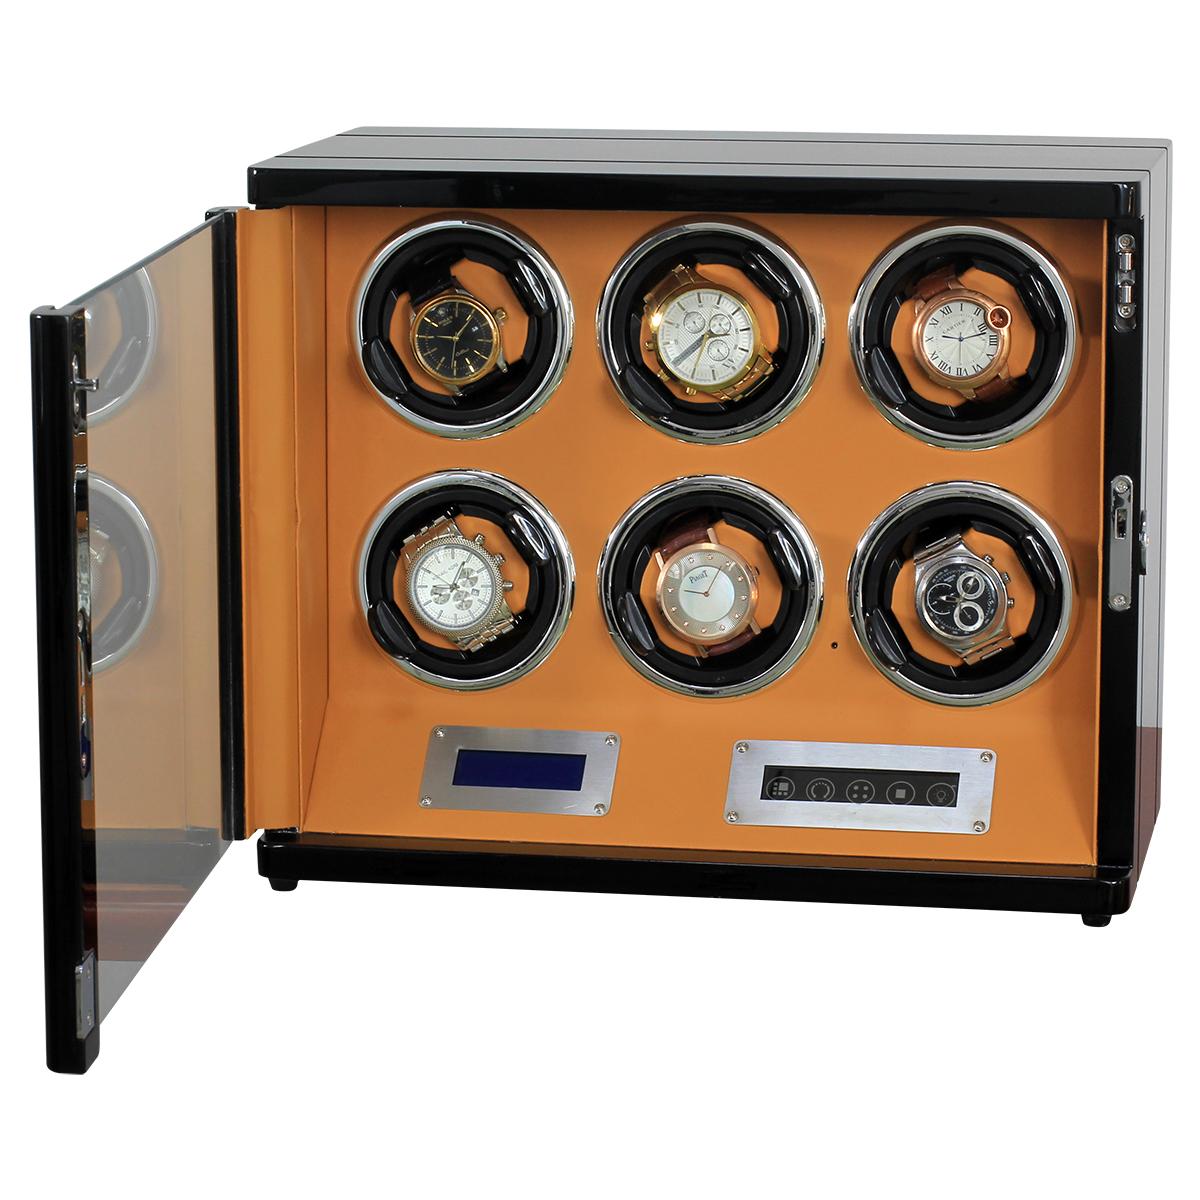 HOKUTO ワインディングマシーン 腕時計自動巻き器 ウォッチワインダー 6本巻き上げLEDライト付き 超静音